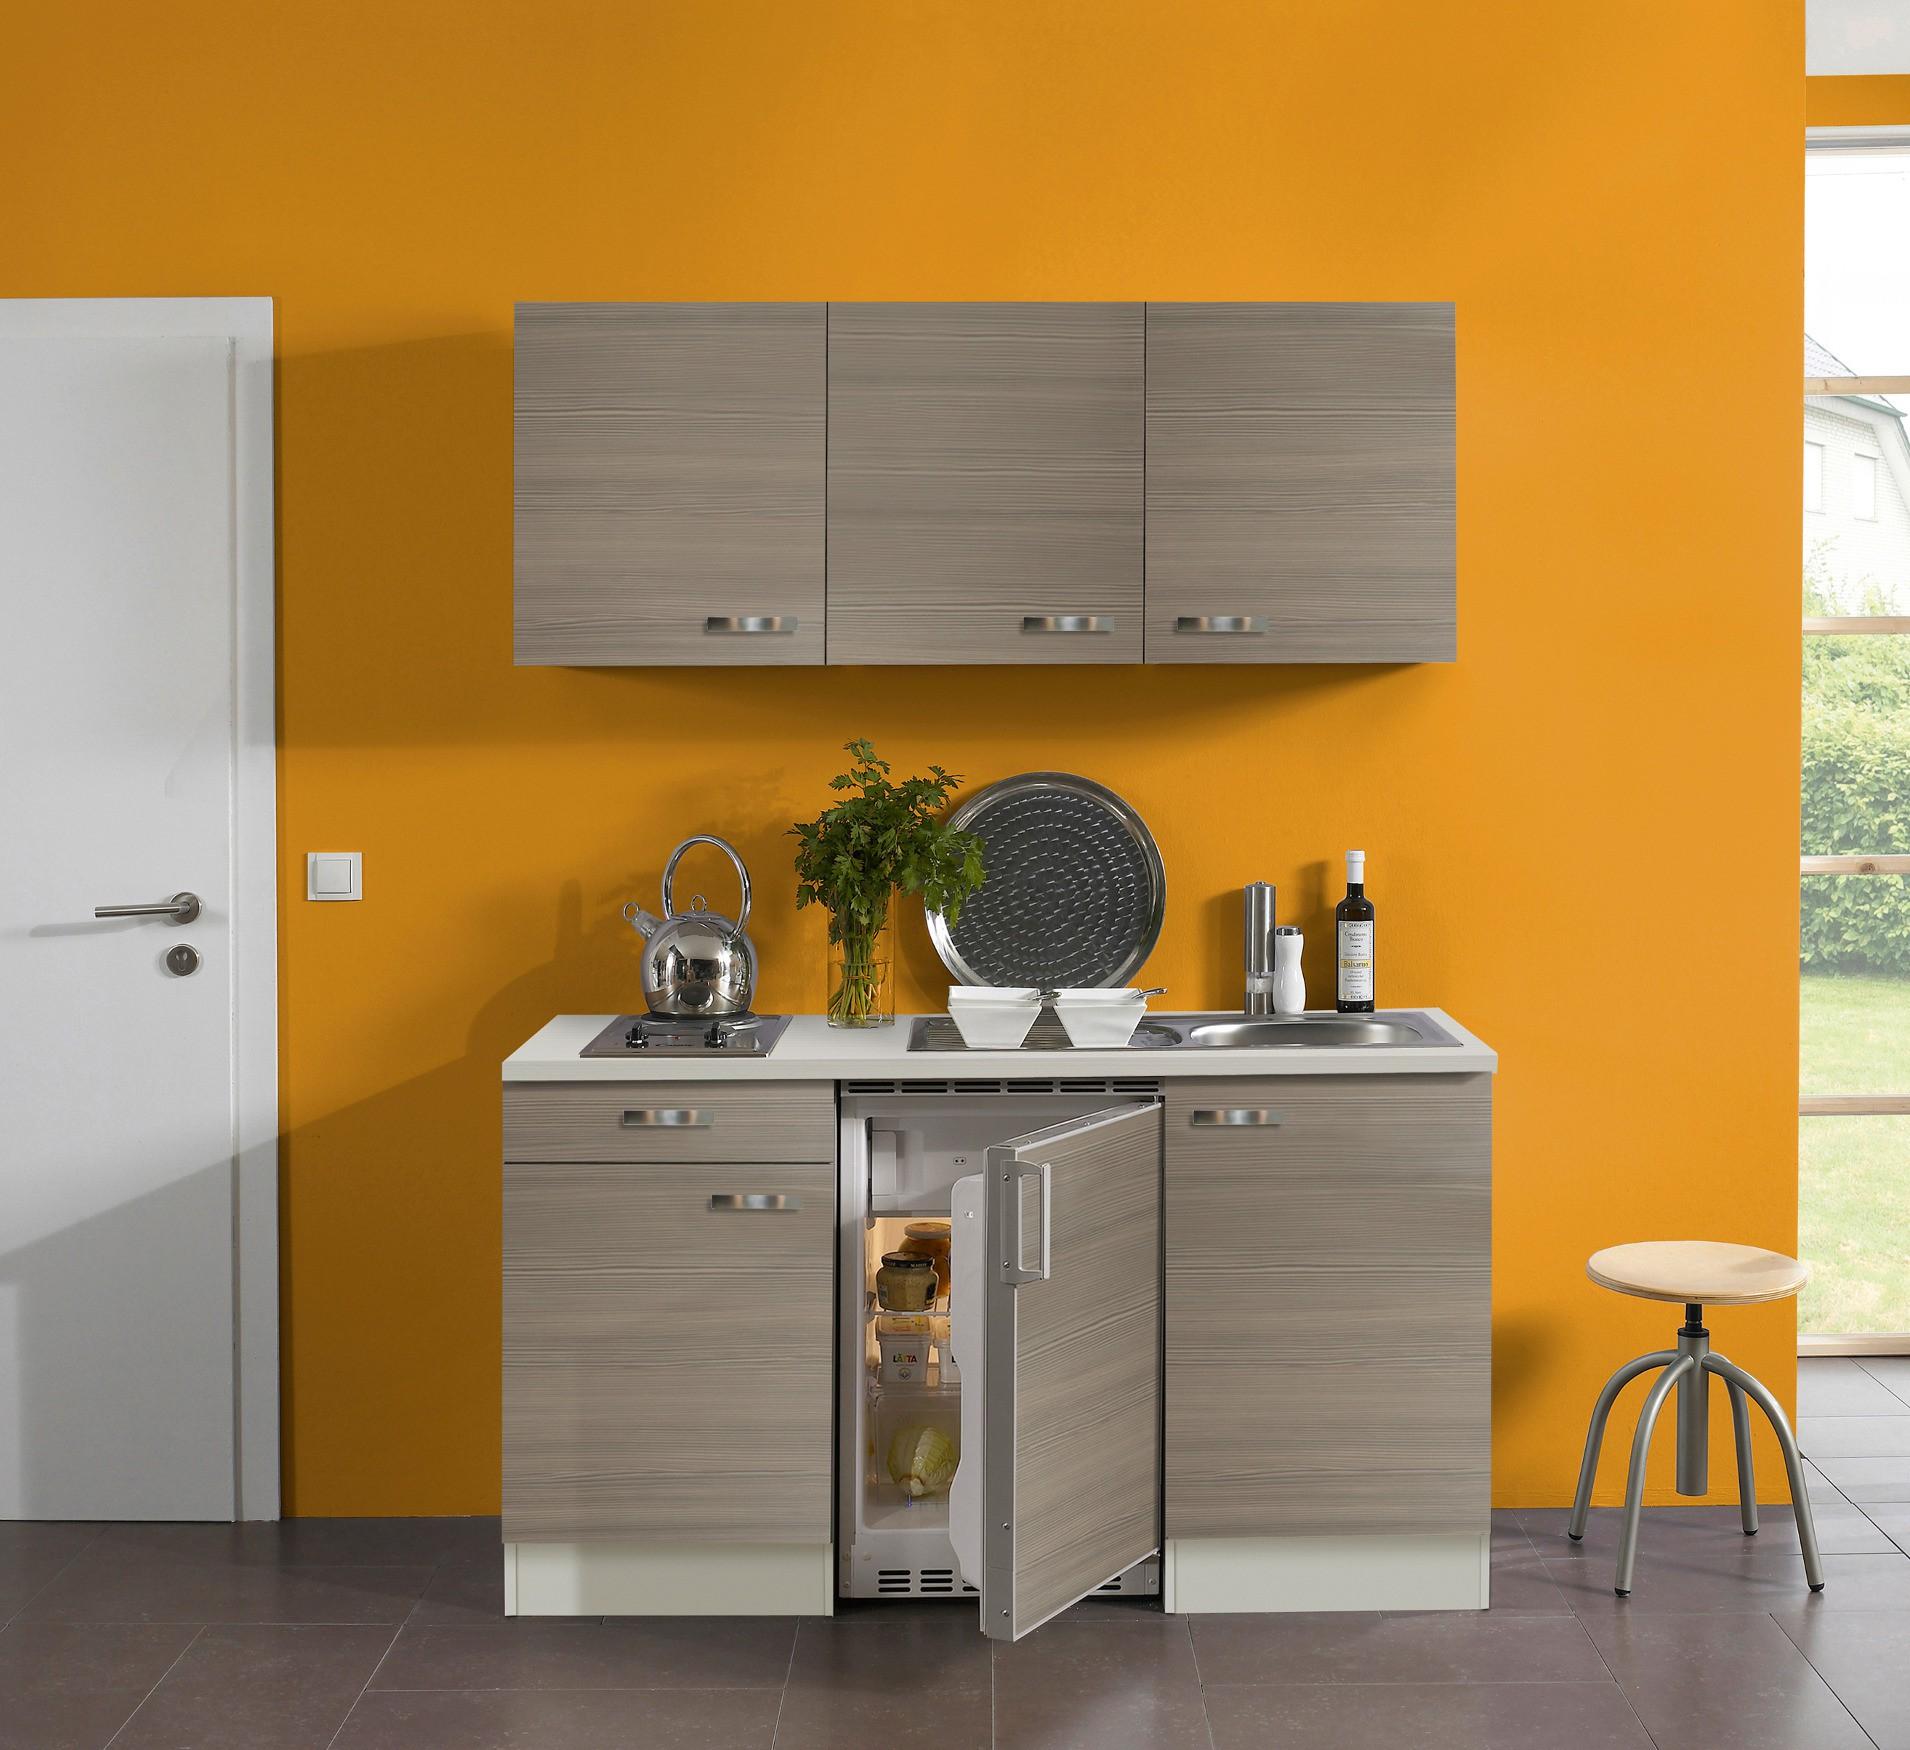 singlek che toledo mit elektro kochfeld 8 teilig breite 150 cm pinie k che singlek chen. Black Bedroom Furniture Sets. Home Design Ideas